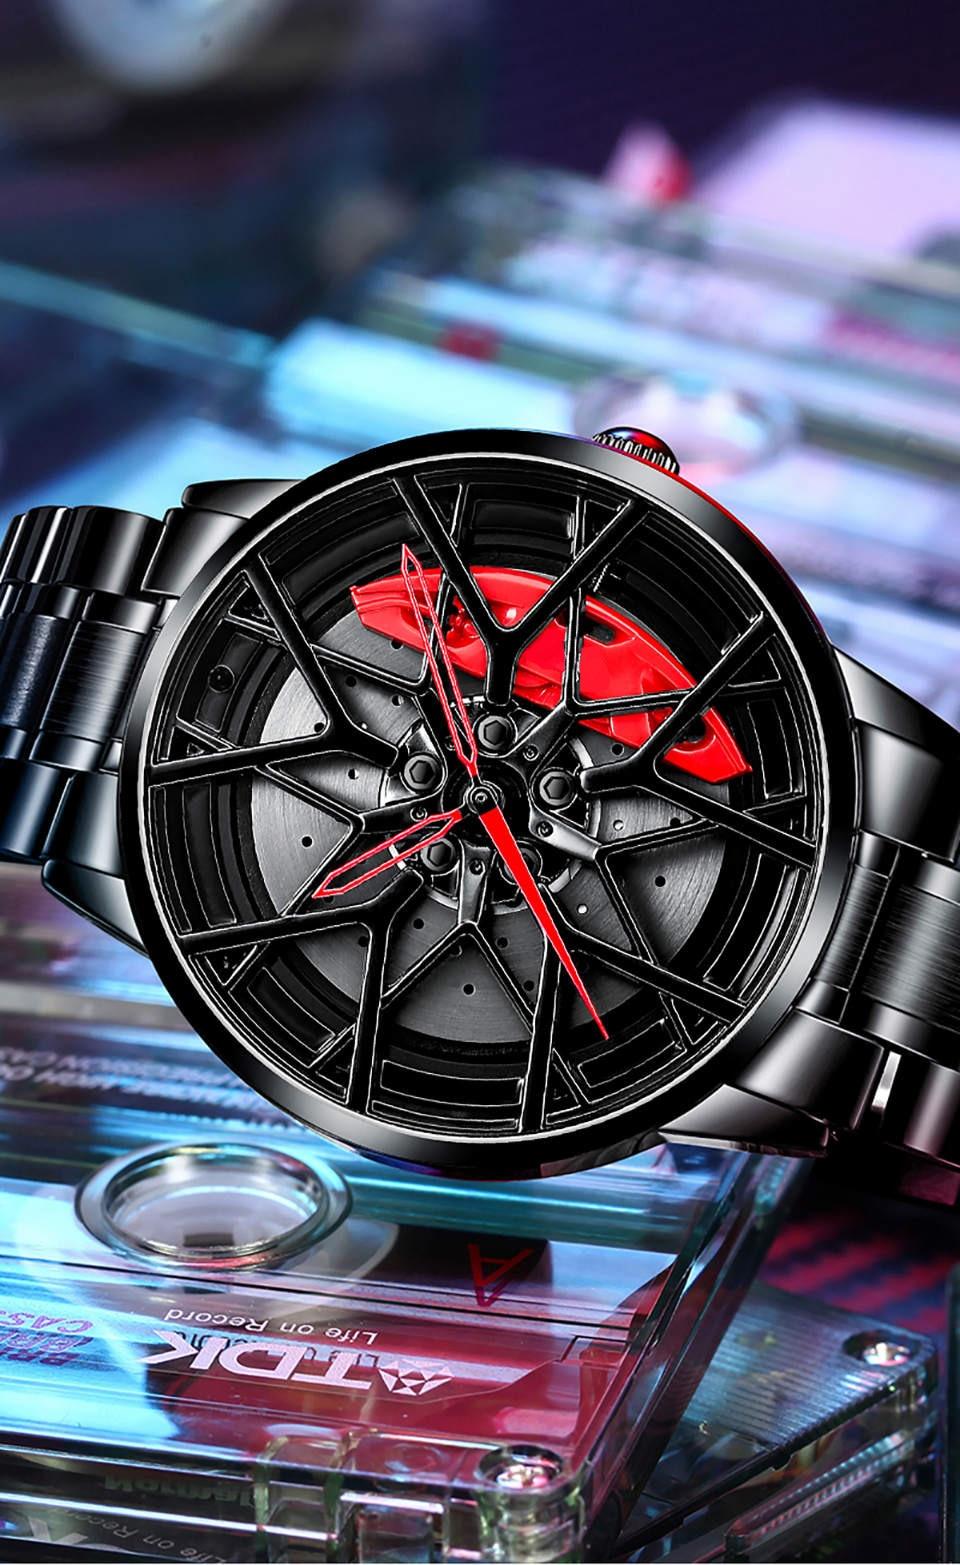 Hccf93d773b564ff6ad06a850e59a4143b NIBOSI 2020 Car Rim Hub Wheel Watch Custom Design